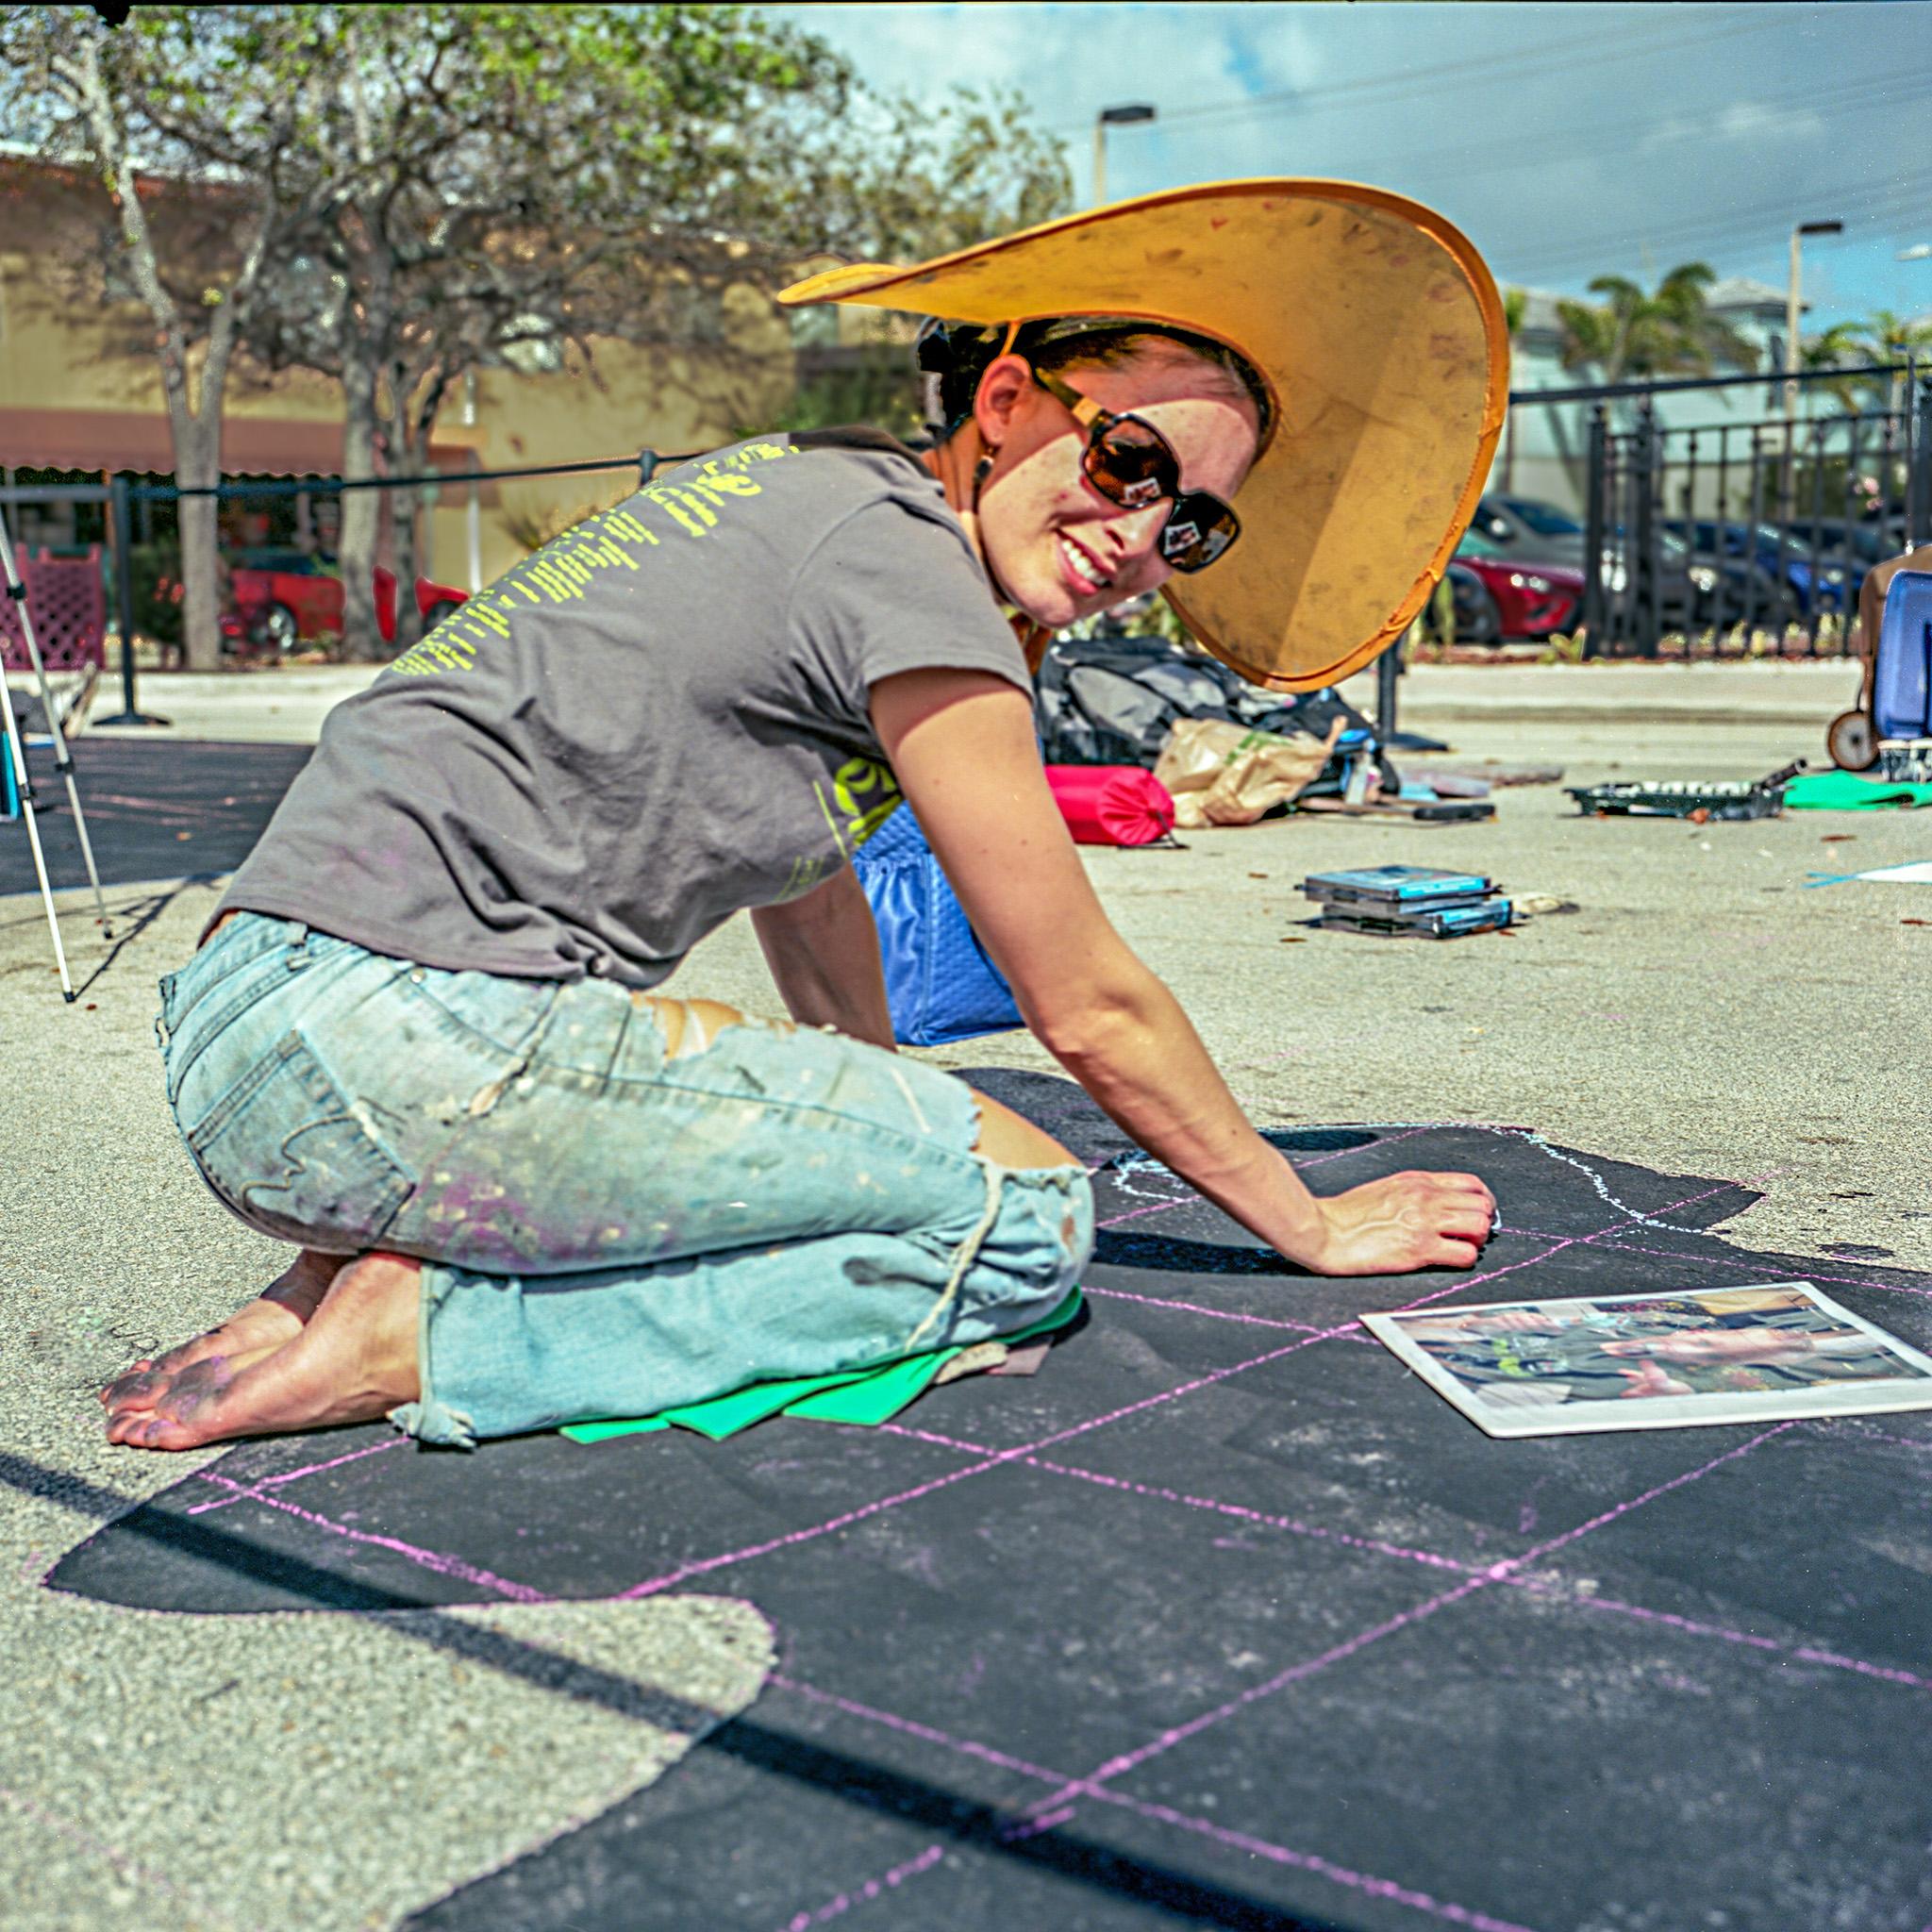 Jim LaRocco | Street Art | Rolleiflex | 80mm